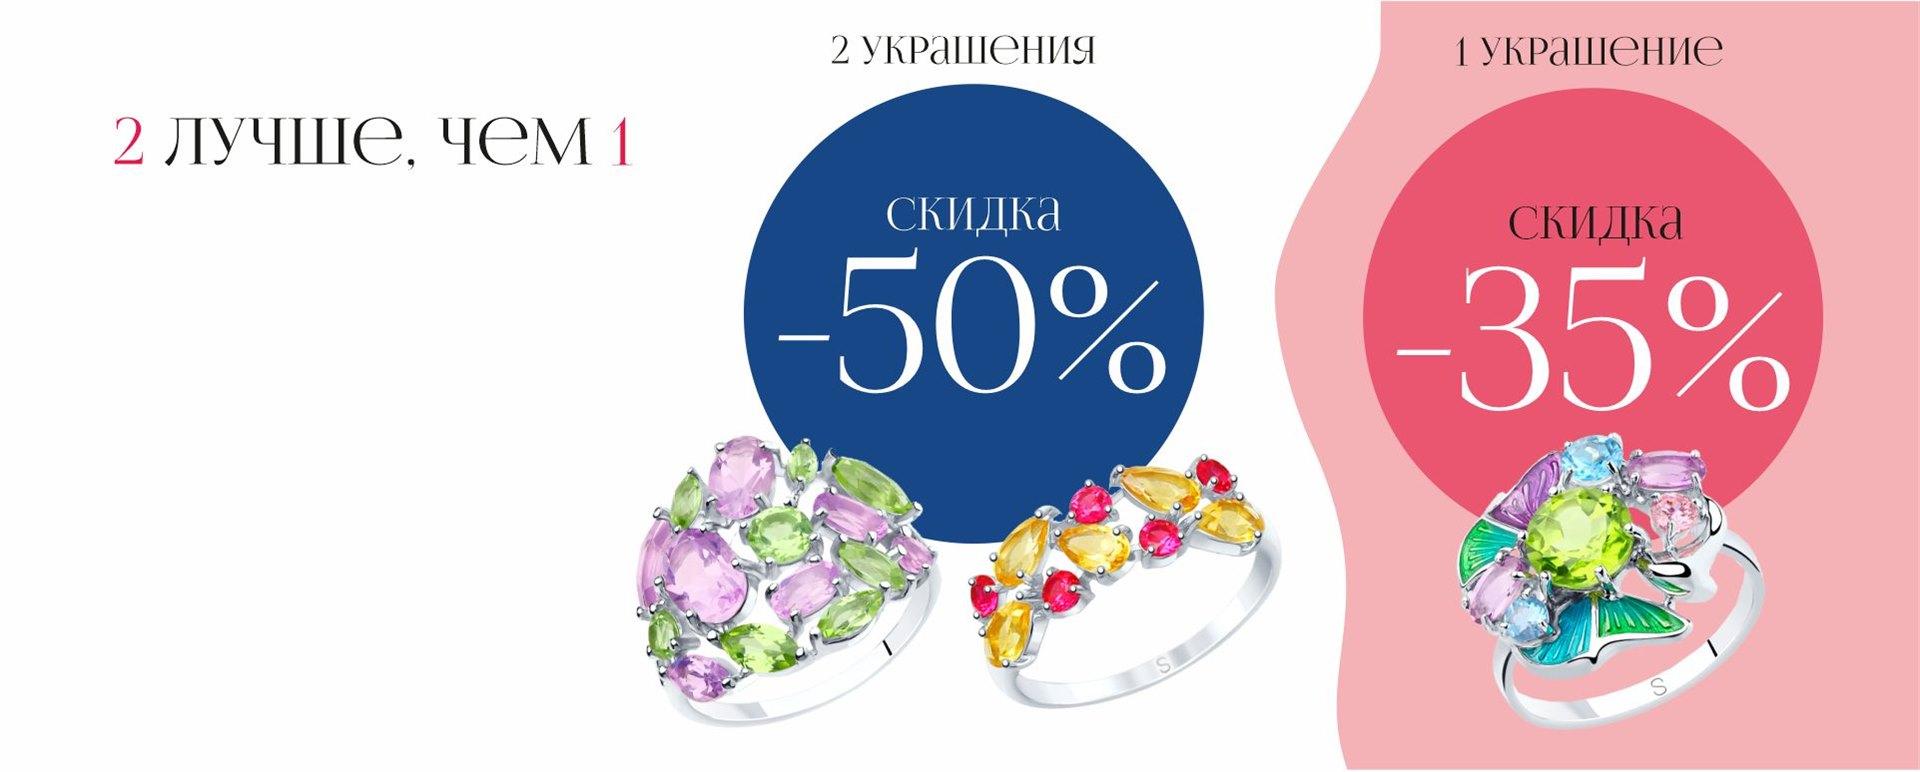 https://www.almazcom.ru/pub/img/Info/24/banner_sajt_skidka_50_na_vtoroe_ukrashenie_2020.jpg